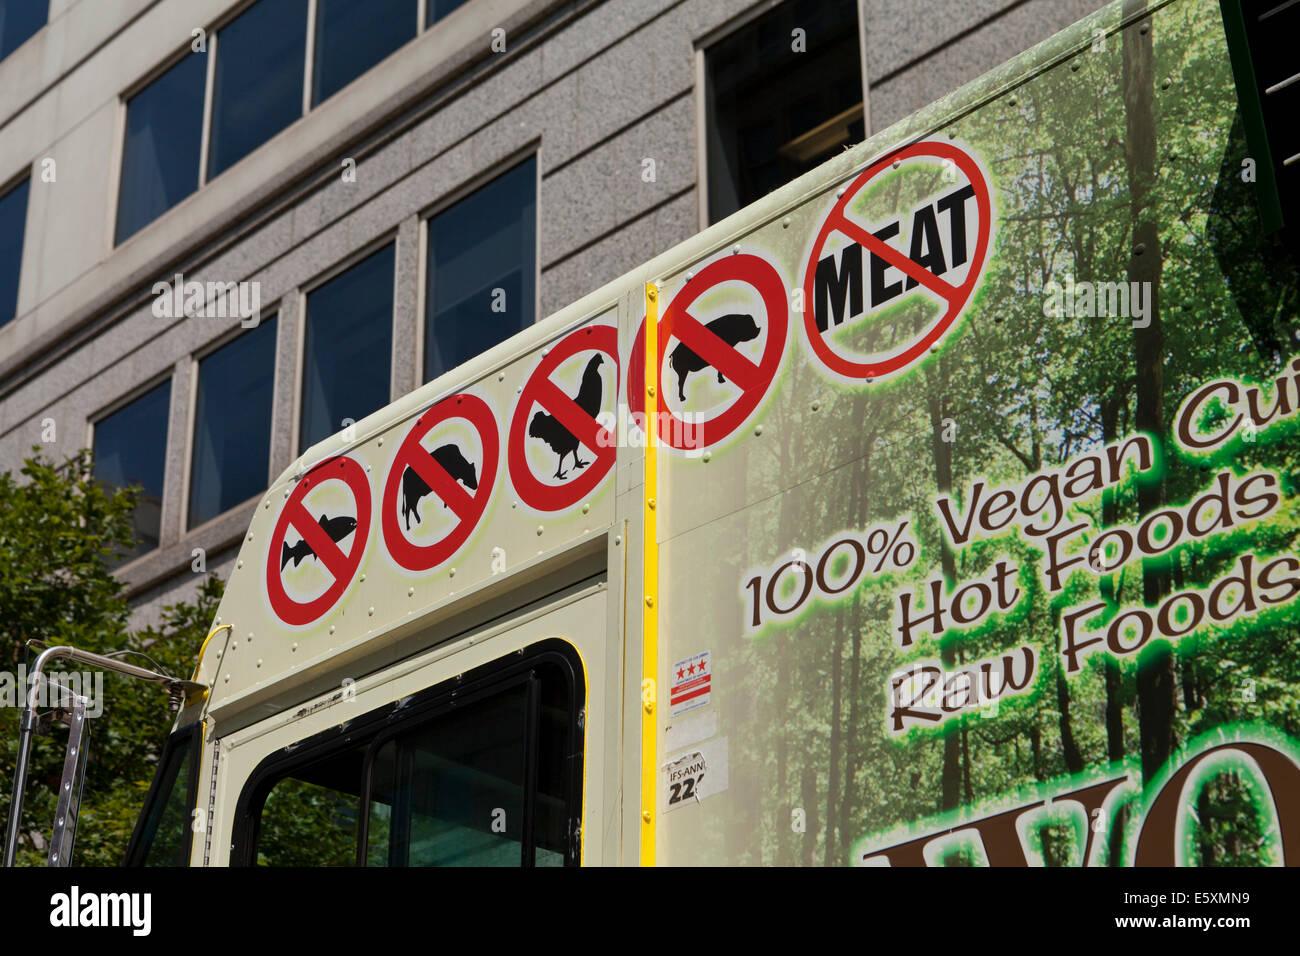 No meat signs on vegan food truck - Washington, DC USA - Stock Image